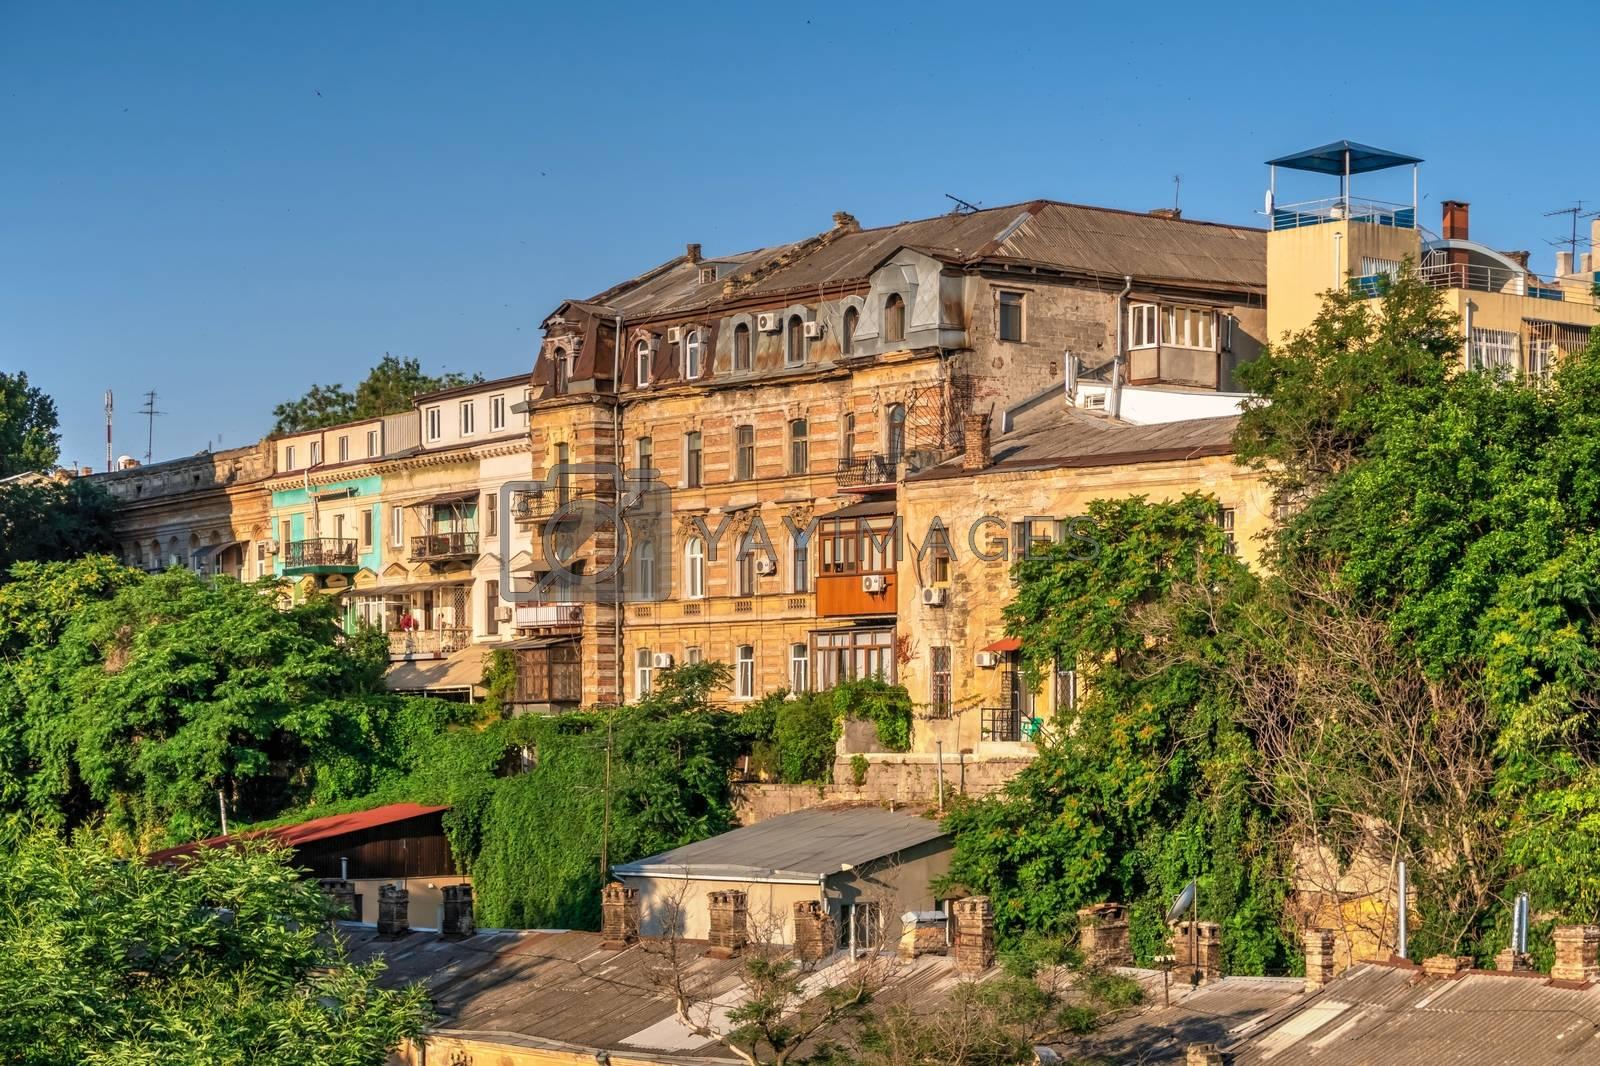 Odessa, Ukraine 06.30.2020. Old  buildings in the historical center of Odessa, Ukraine, on a sunny summer morning